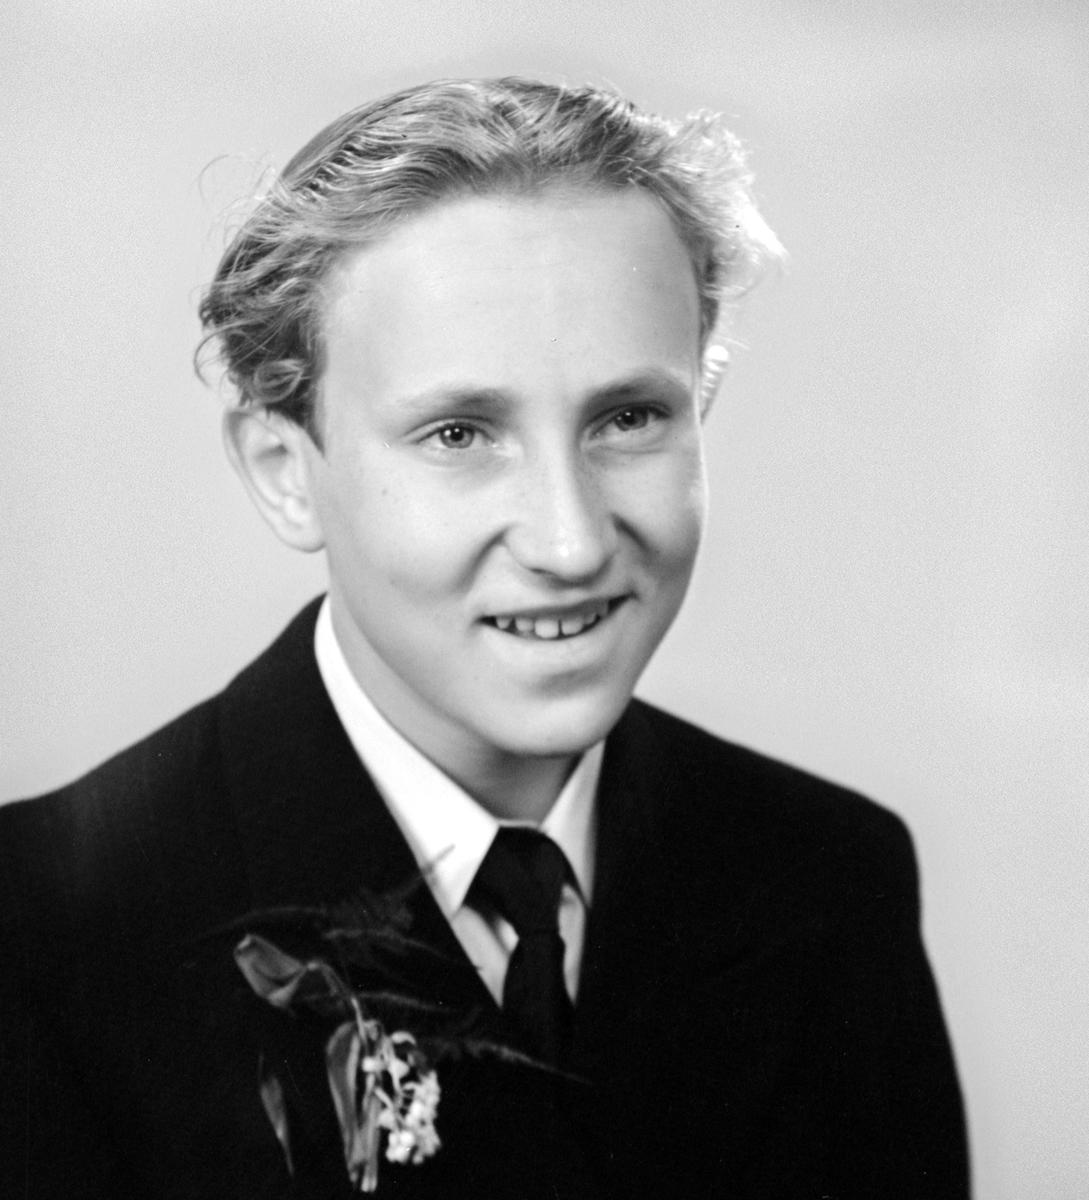 Konfirmanden Bertil Abrahamsson. Foto i maj 1950.